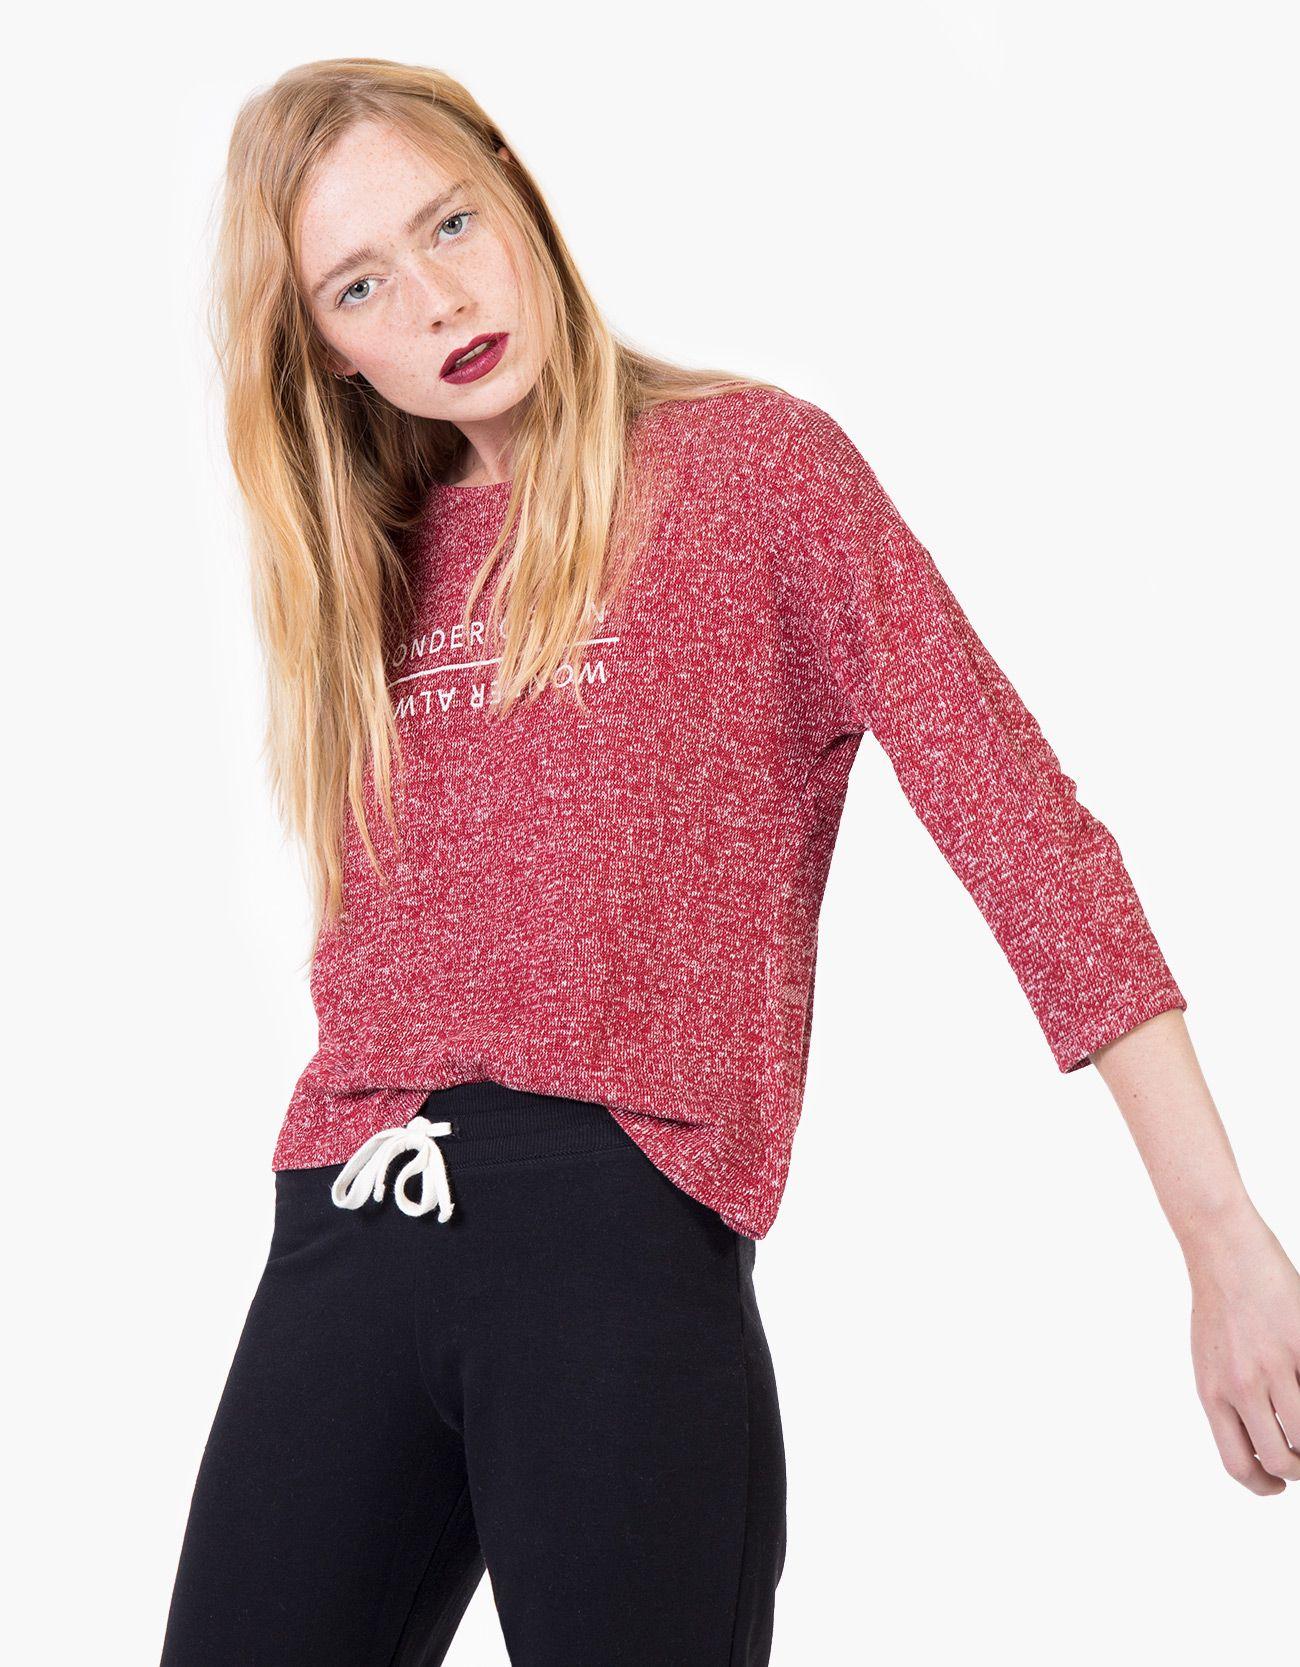 Camiseta posicional punto cortado : CHICA Camisetas   Ropa femenina ...